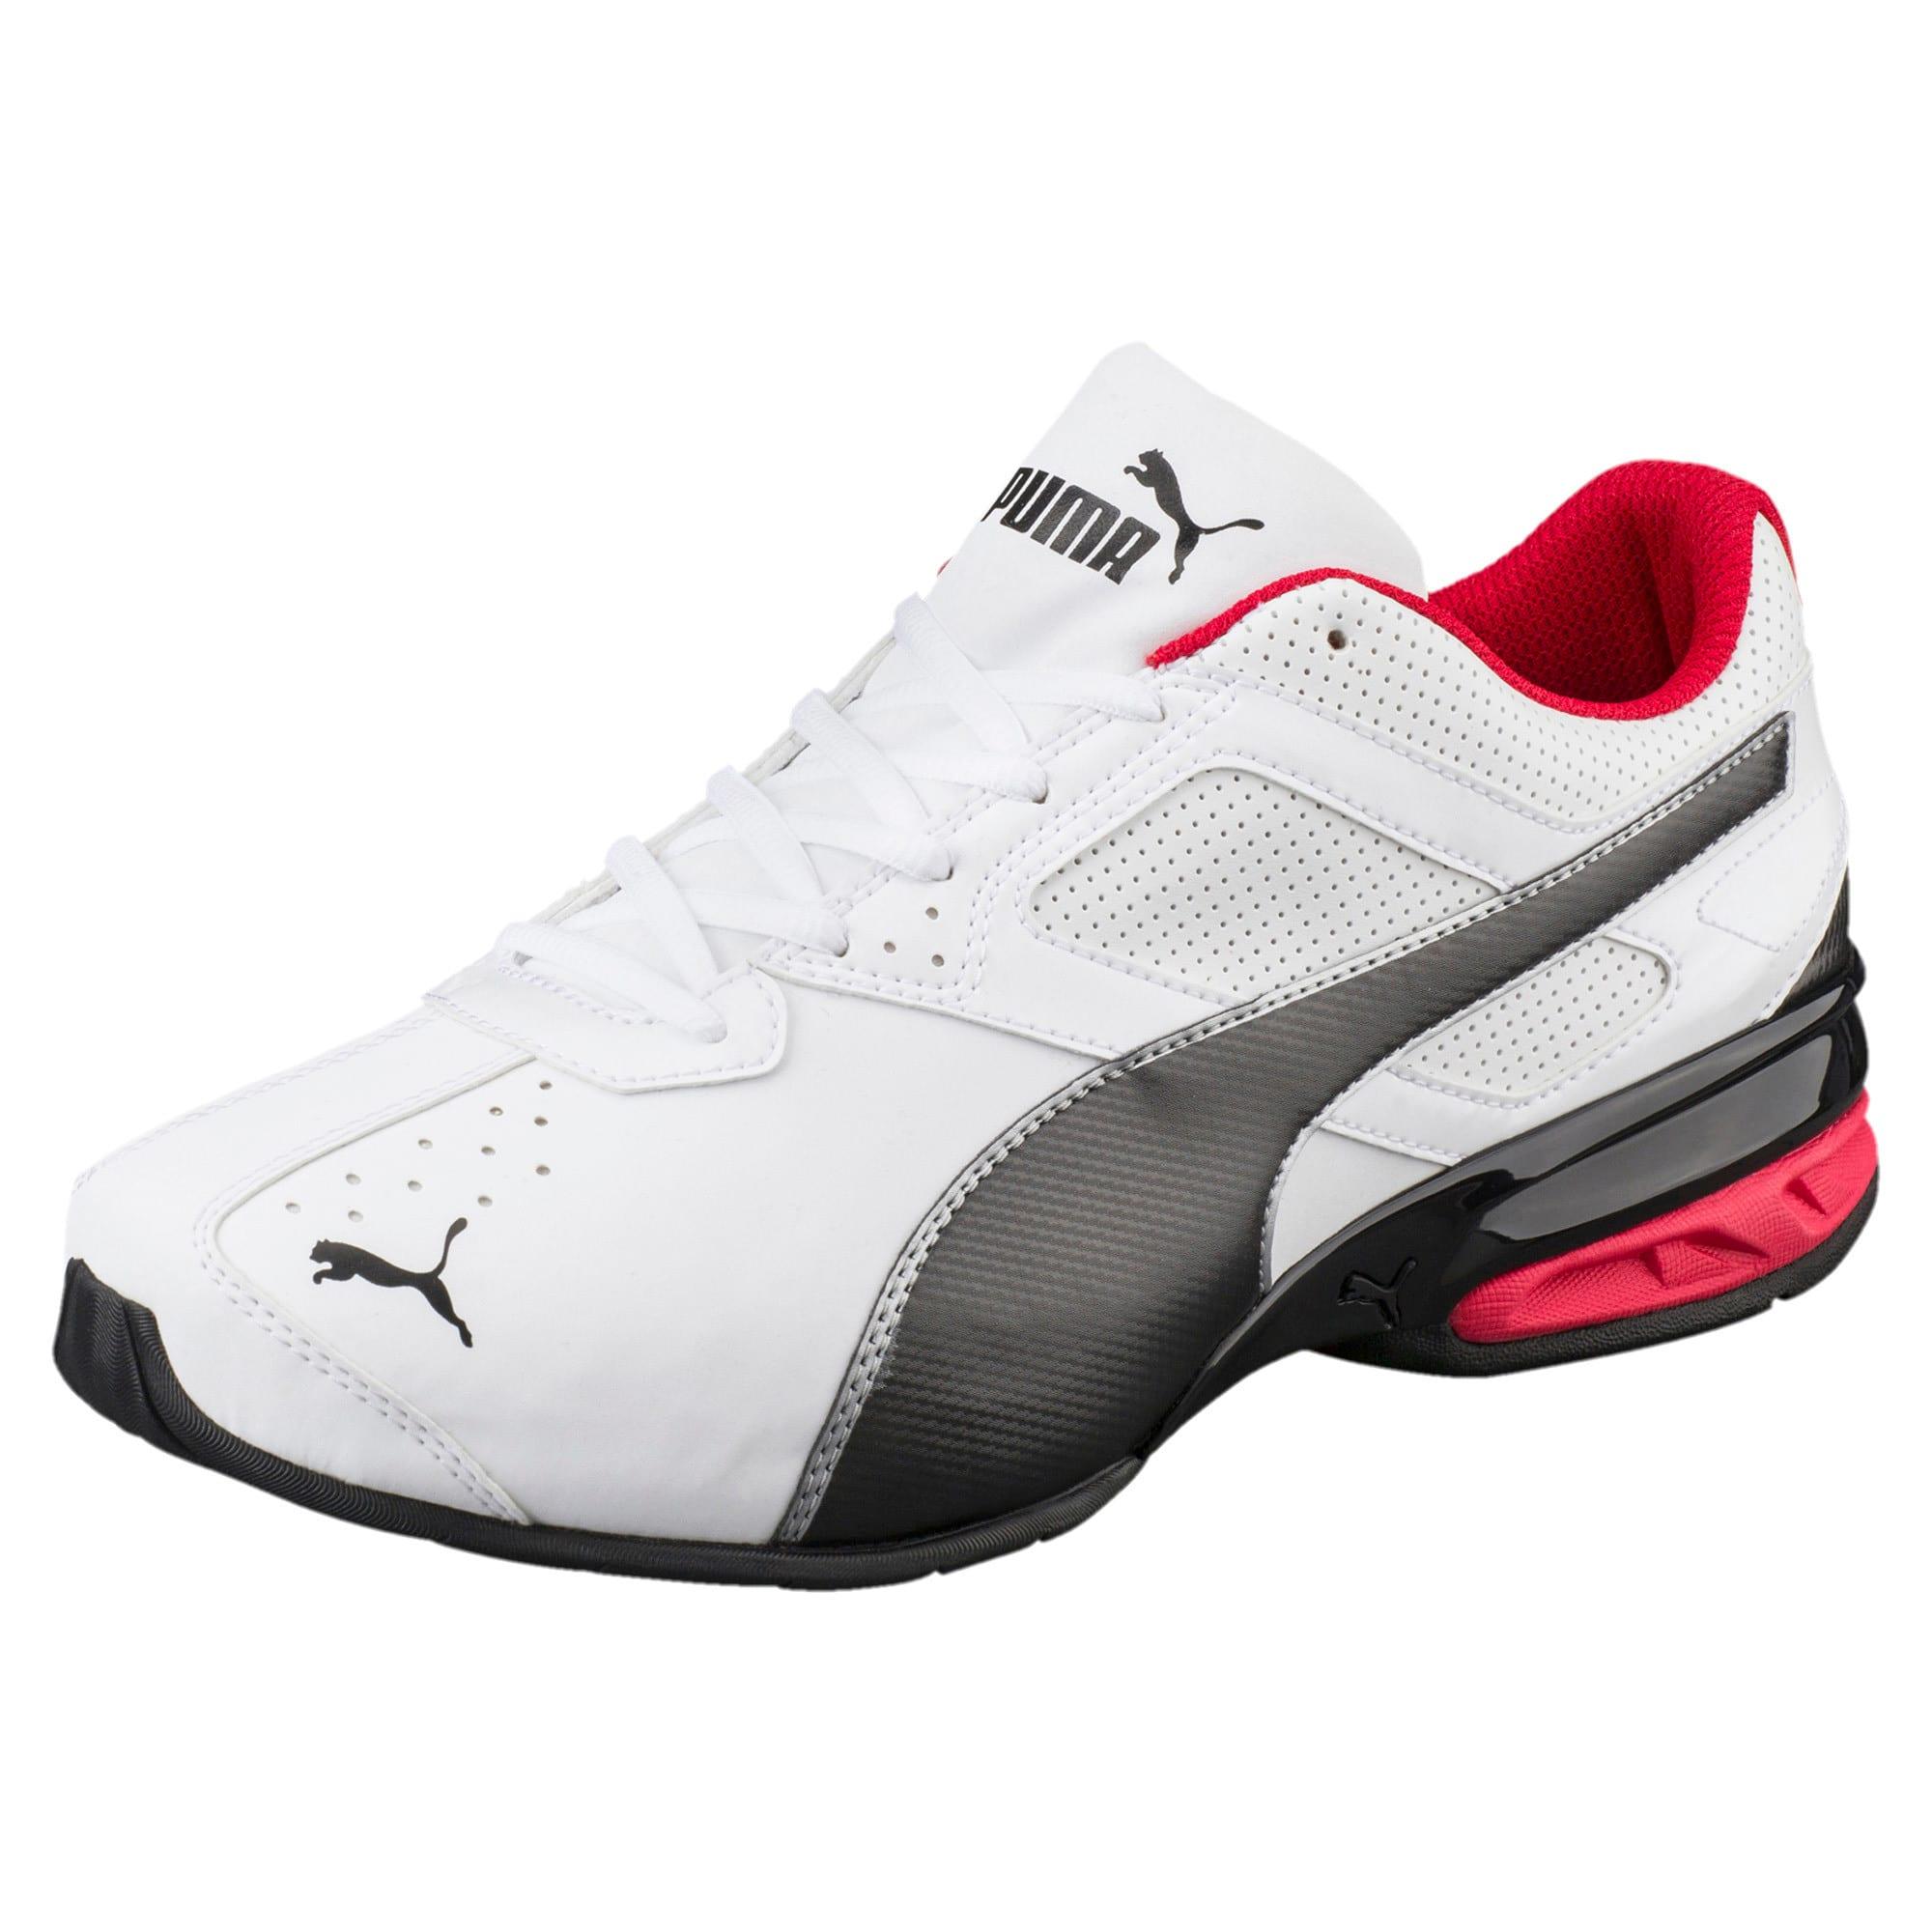 Thumbnail 1 of Tazon 6 FM Wide Men's Sneakers, White-Black-puma silver, medium